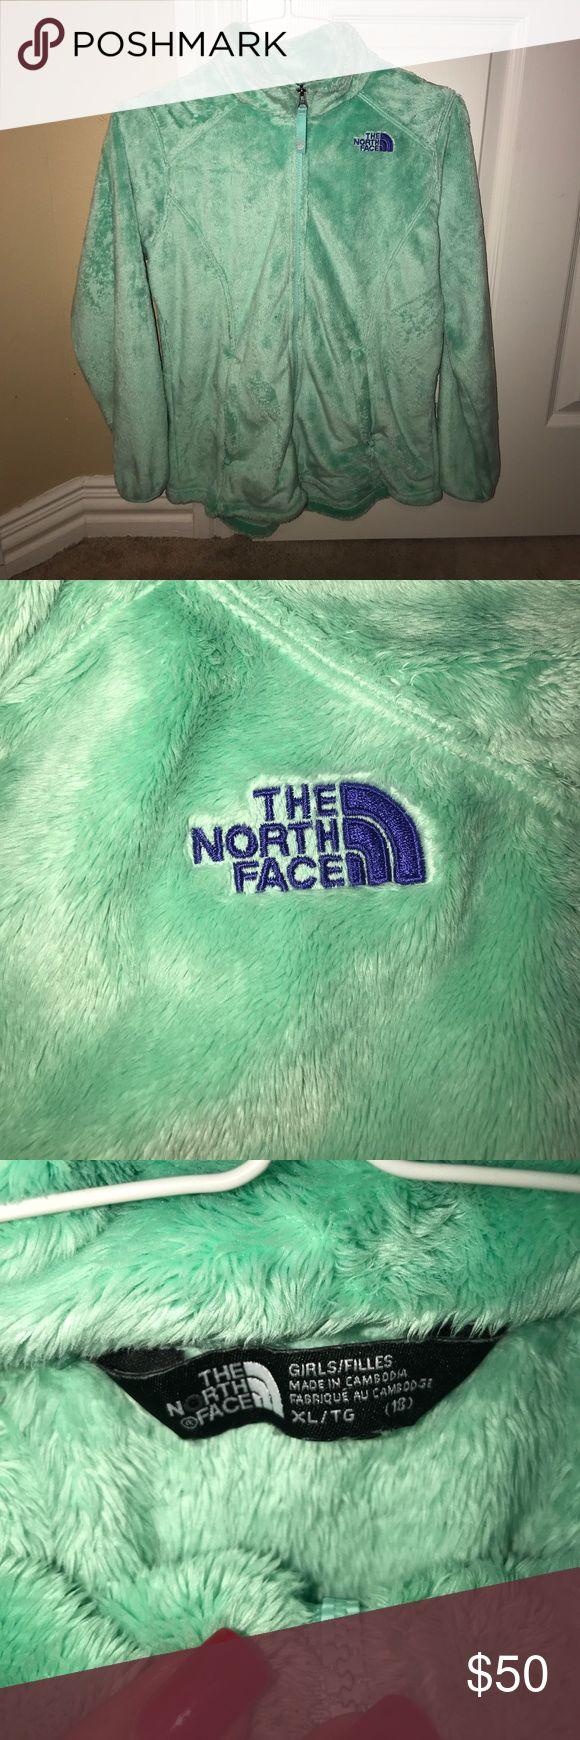 Mint green Girls north face jacket MInt green girls north face jacket! North Face Jackets & Coats